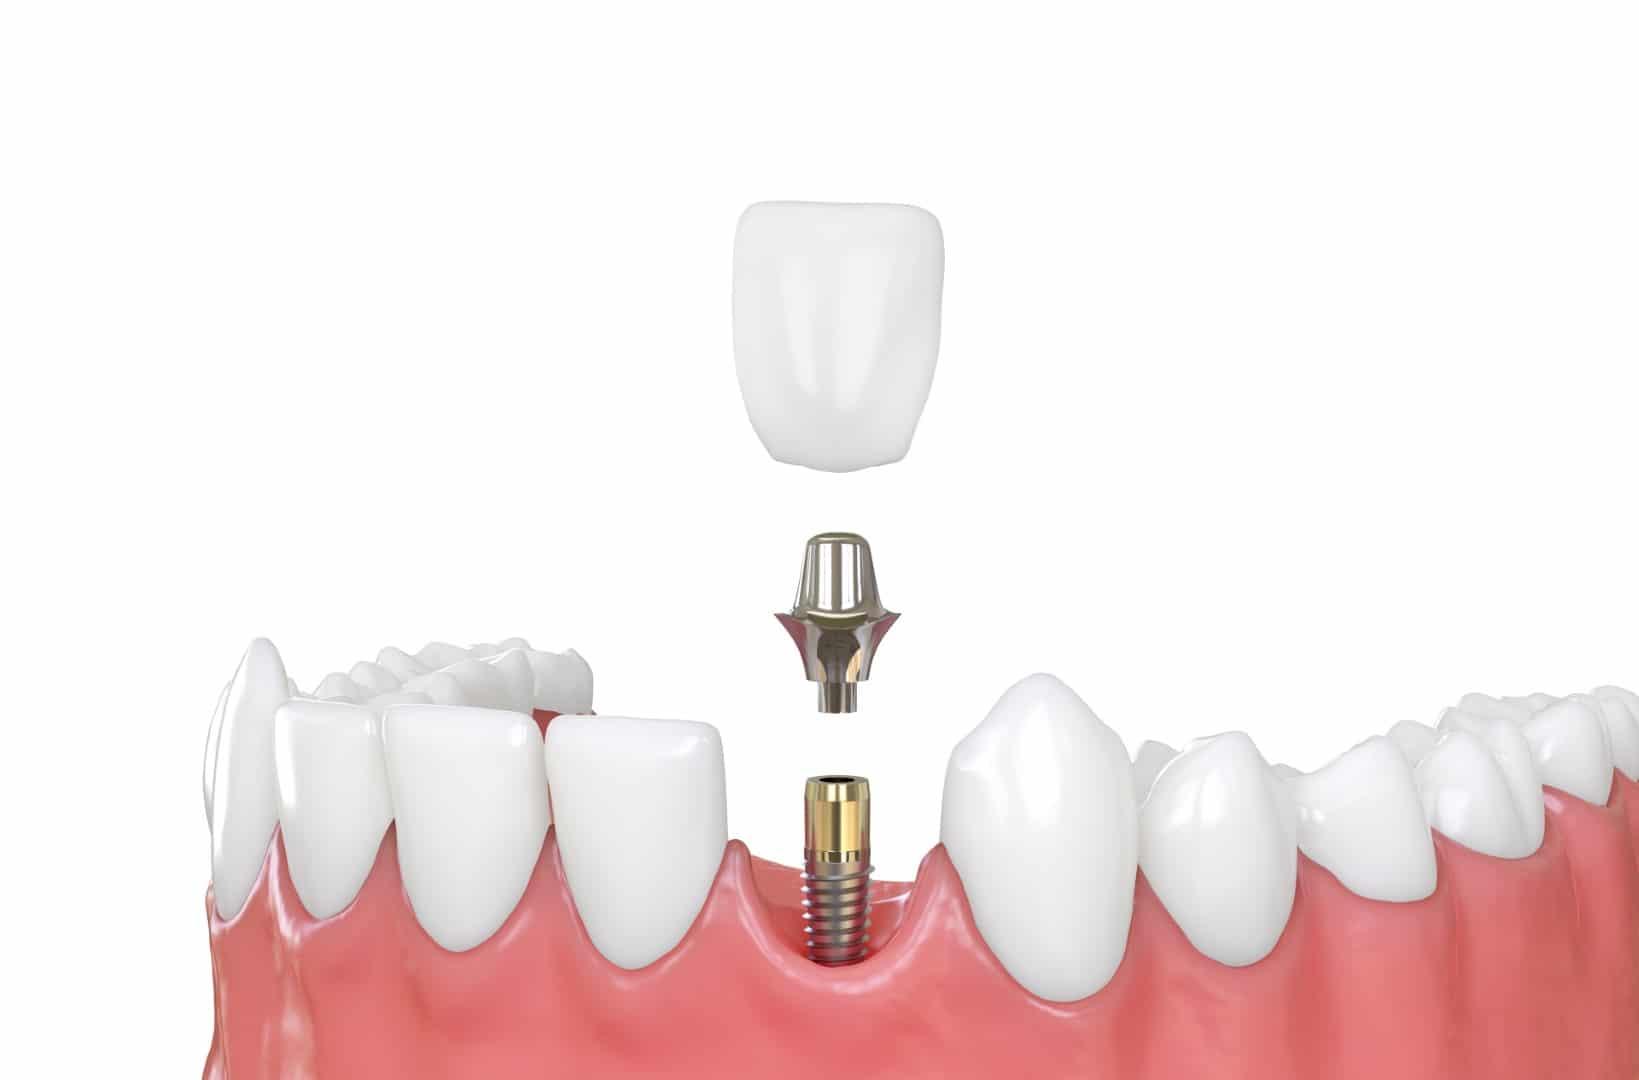 Dental Implants - Dental Care Services - Wodonga Family Dental Clinic